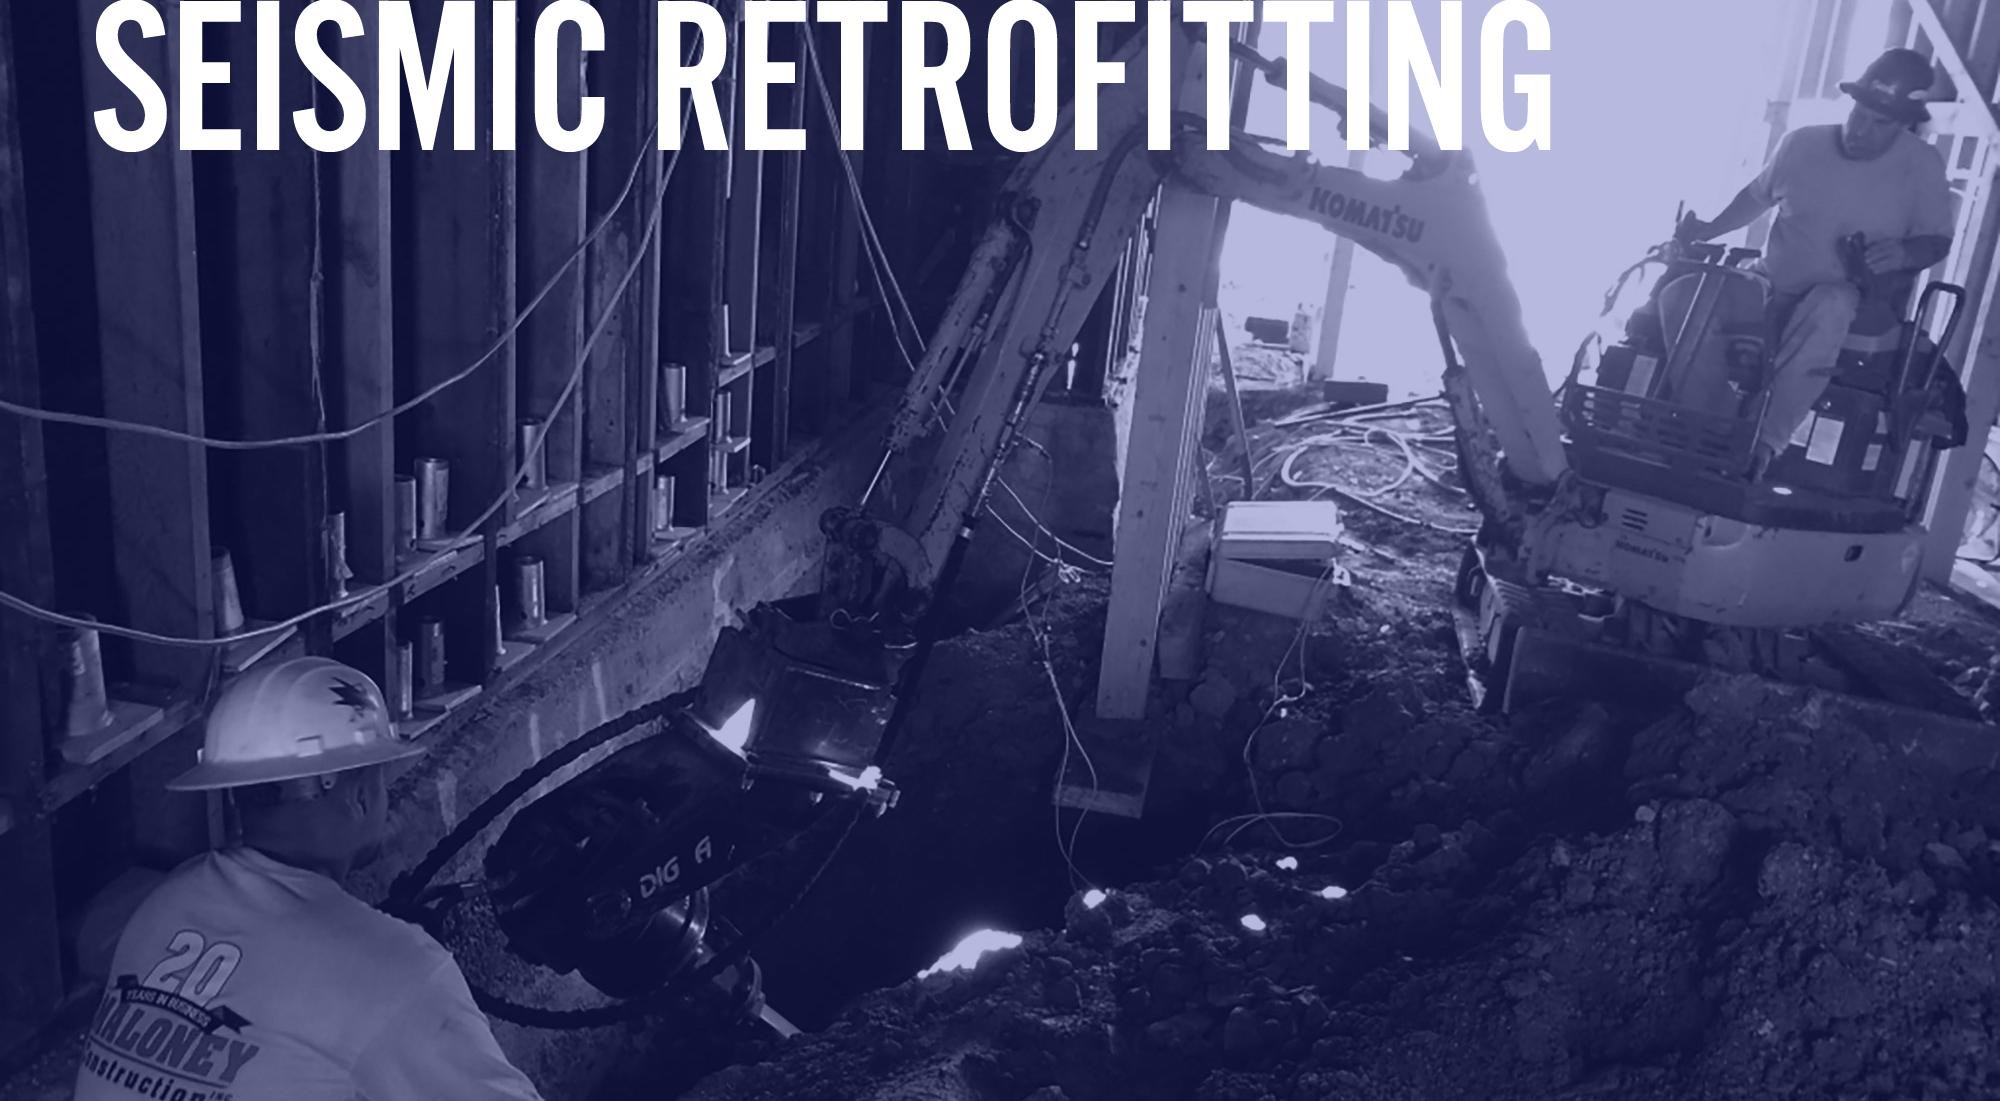 seismic retrofitting